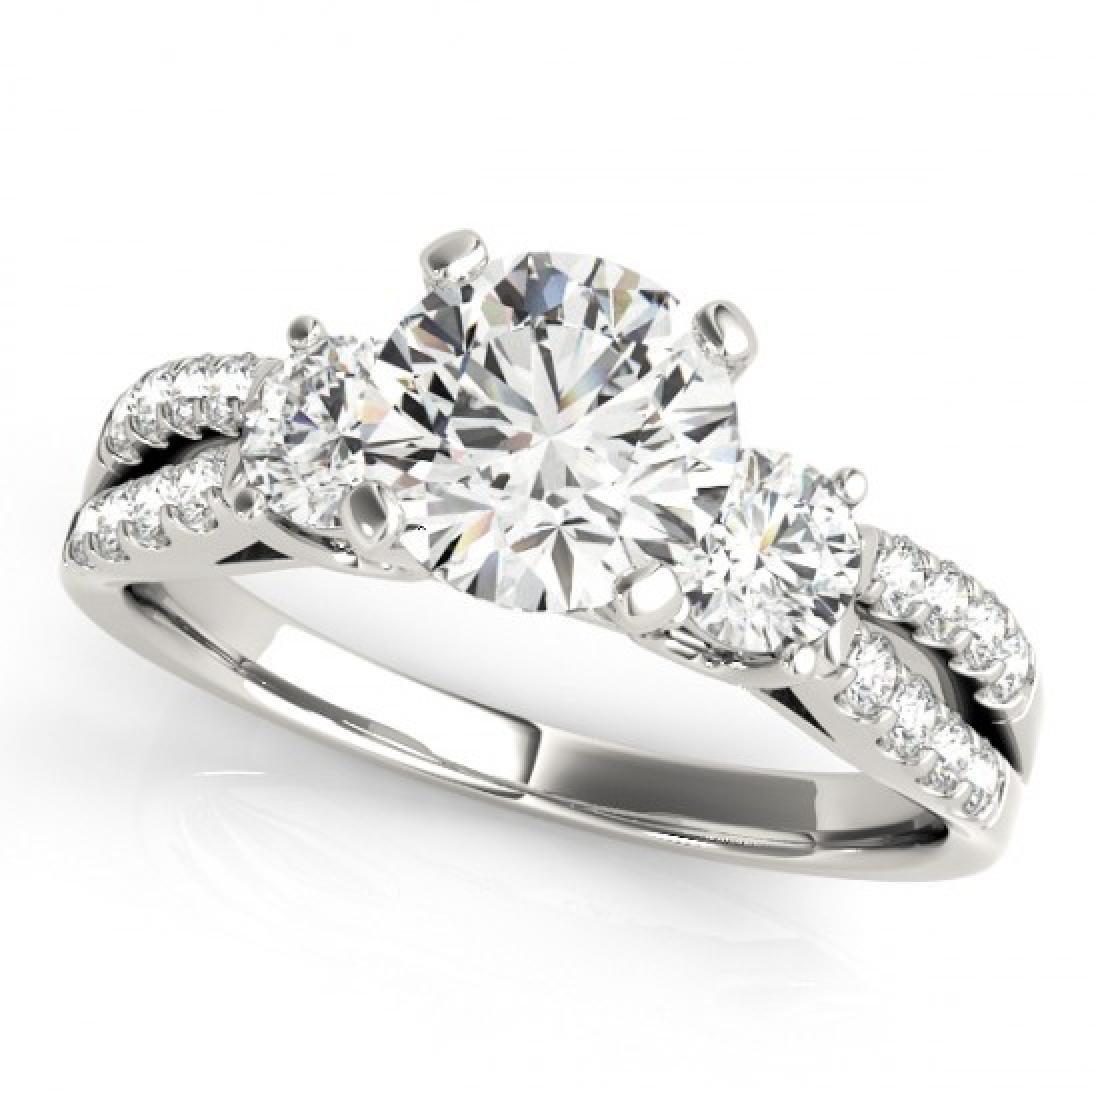 1.25 CTW Certified VS/SI Diamond 3 Stone Ring 18K White